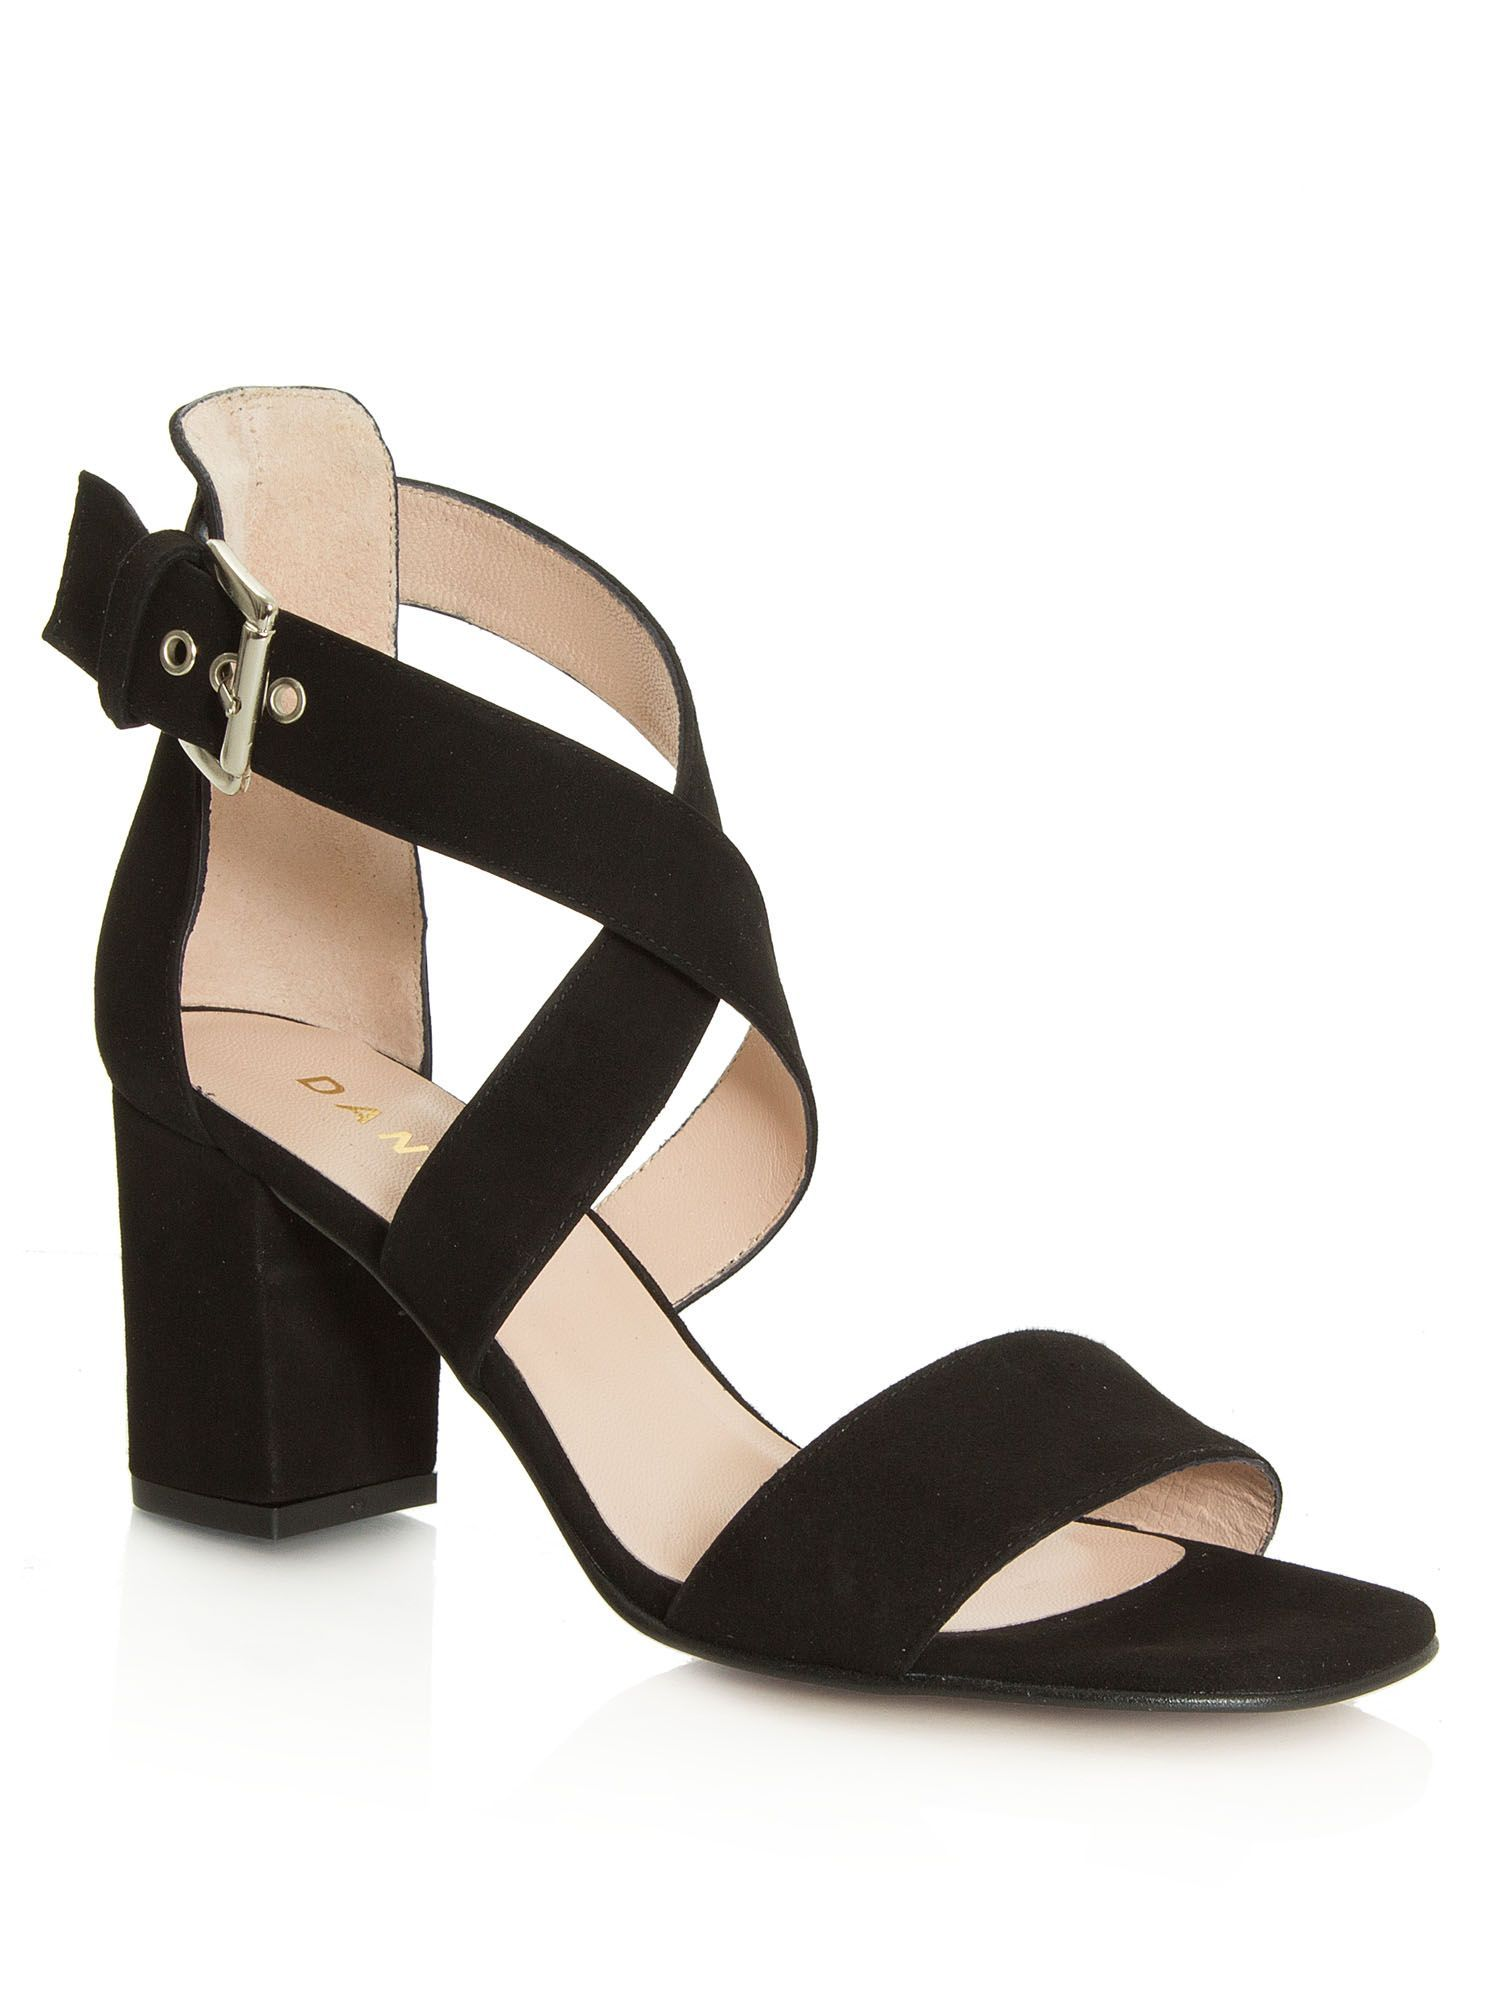 531edc4cb6 Daniel Southaven block heel sandals, Black Ladies Shoes, Strap Sandals,  Block Heels,